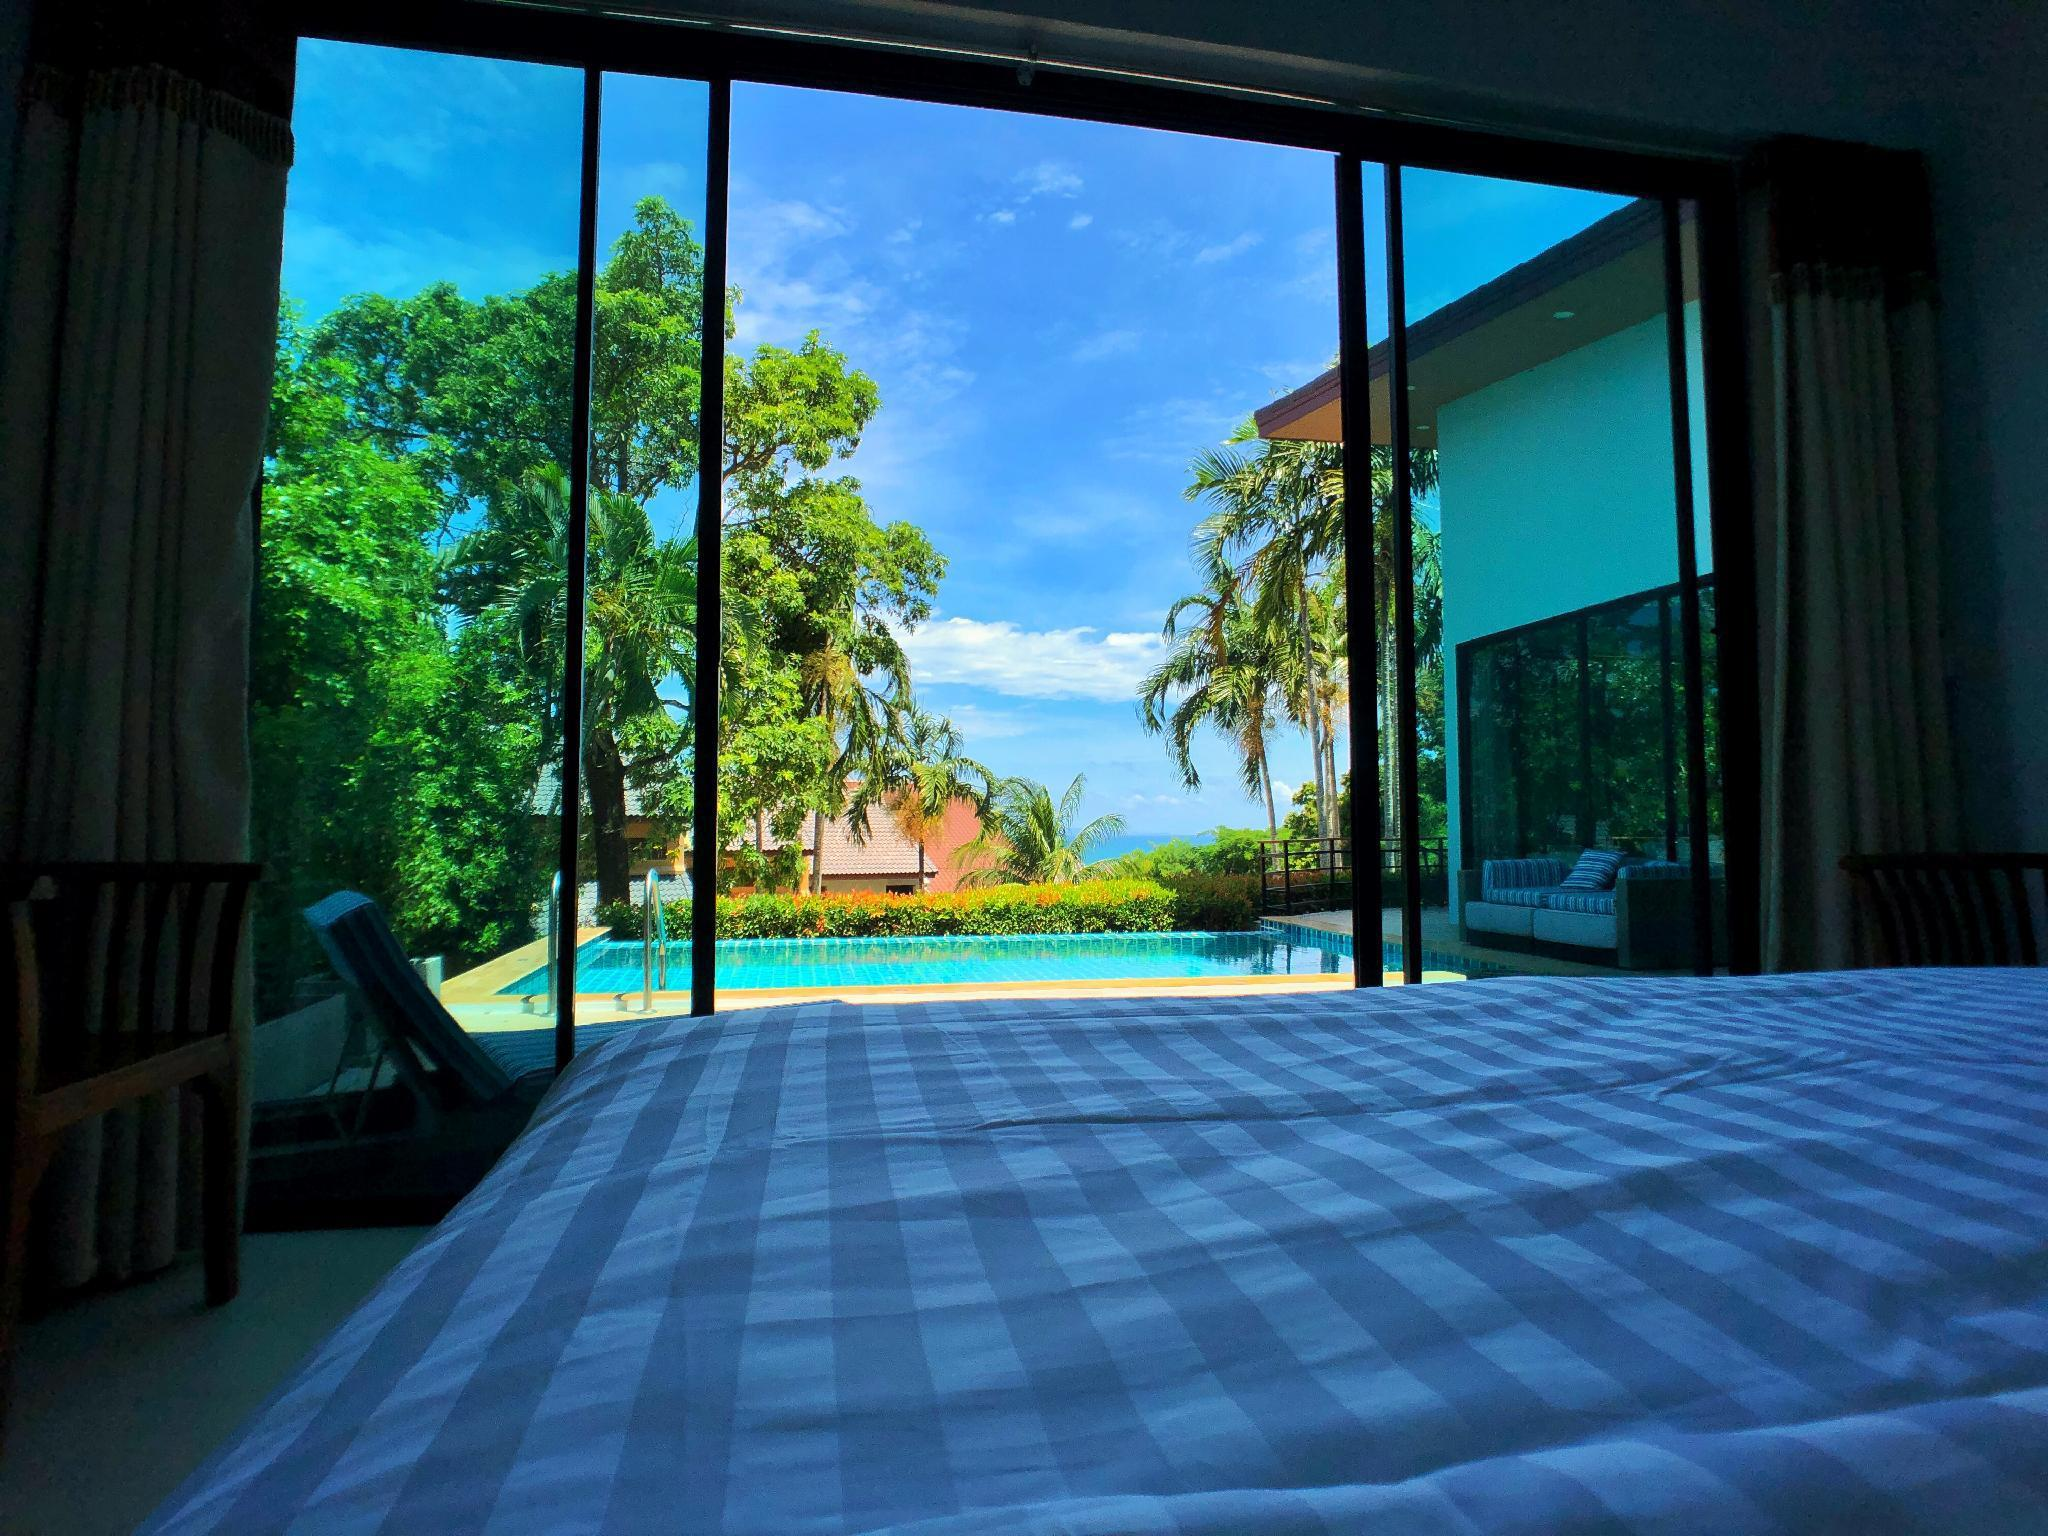 Sea view Villa nearby the Secret beach 300m วิลลา 2 ห้องนอน 3 ห้องน้ำส่วนตัว ขนาด 160 ตร.ม. – ในหาน